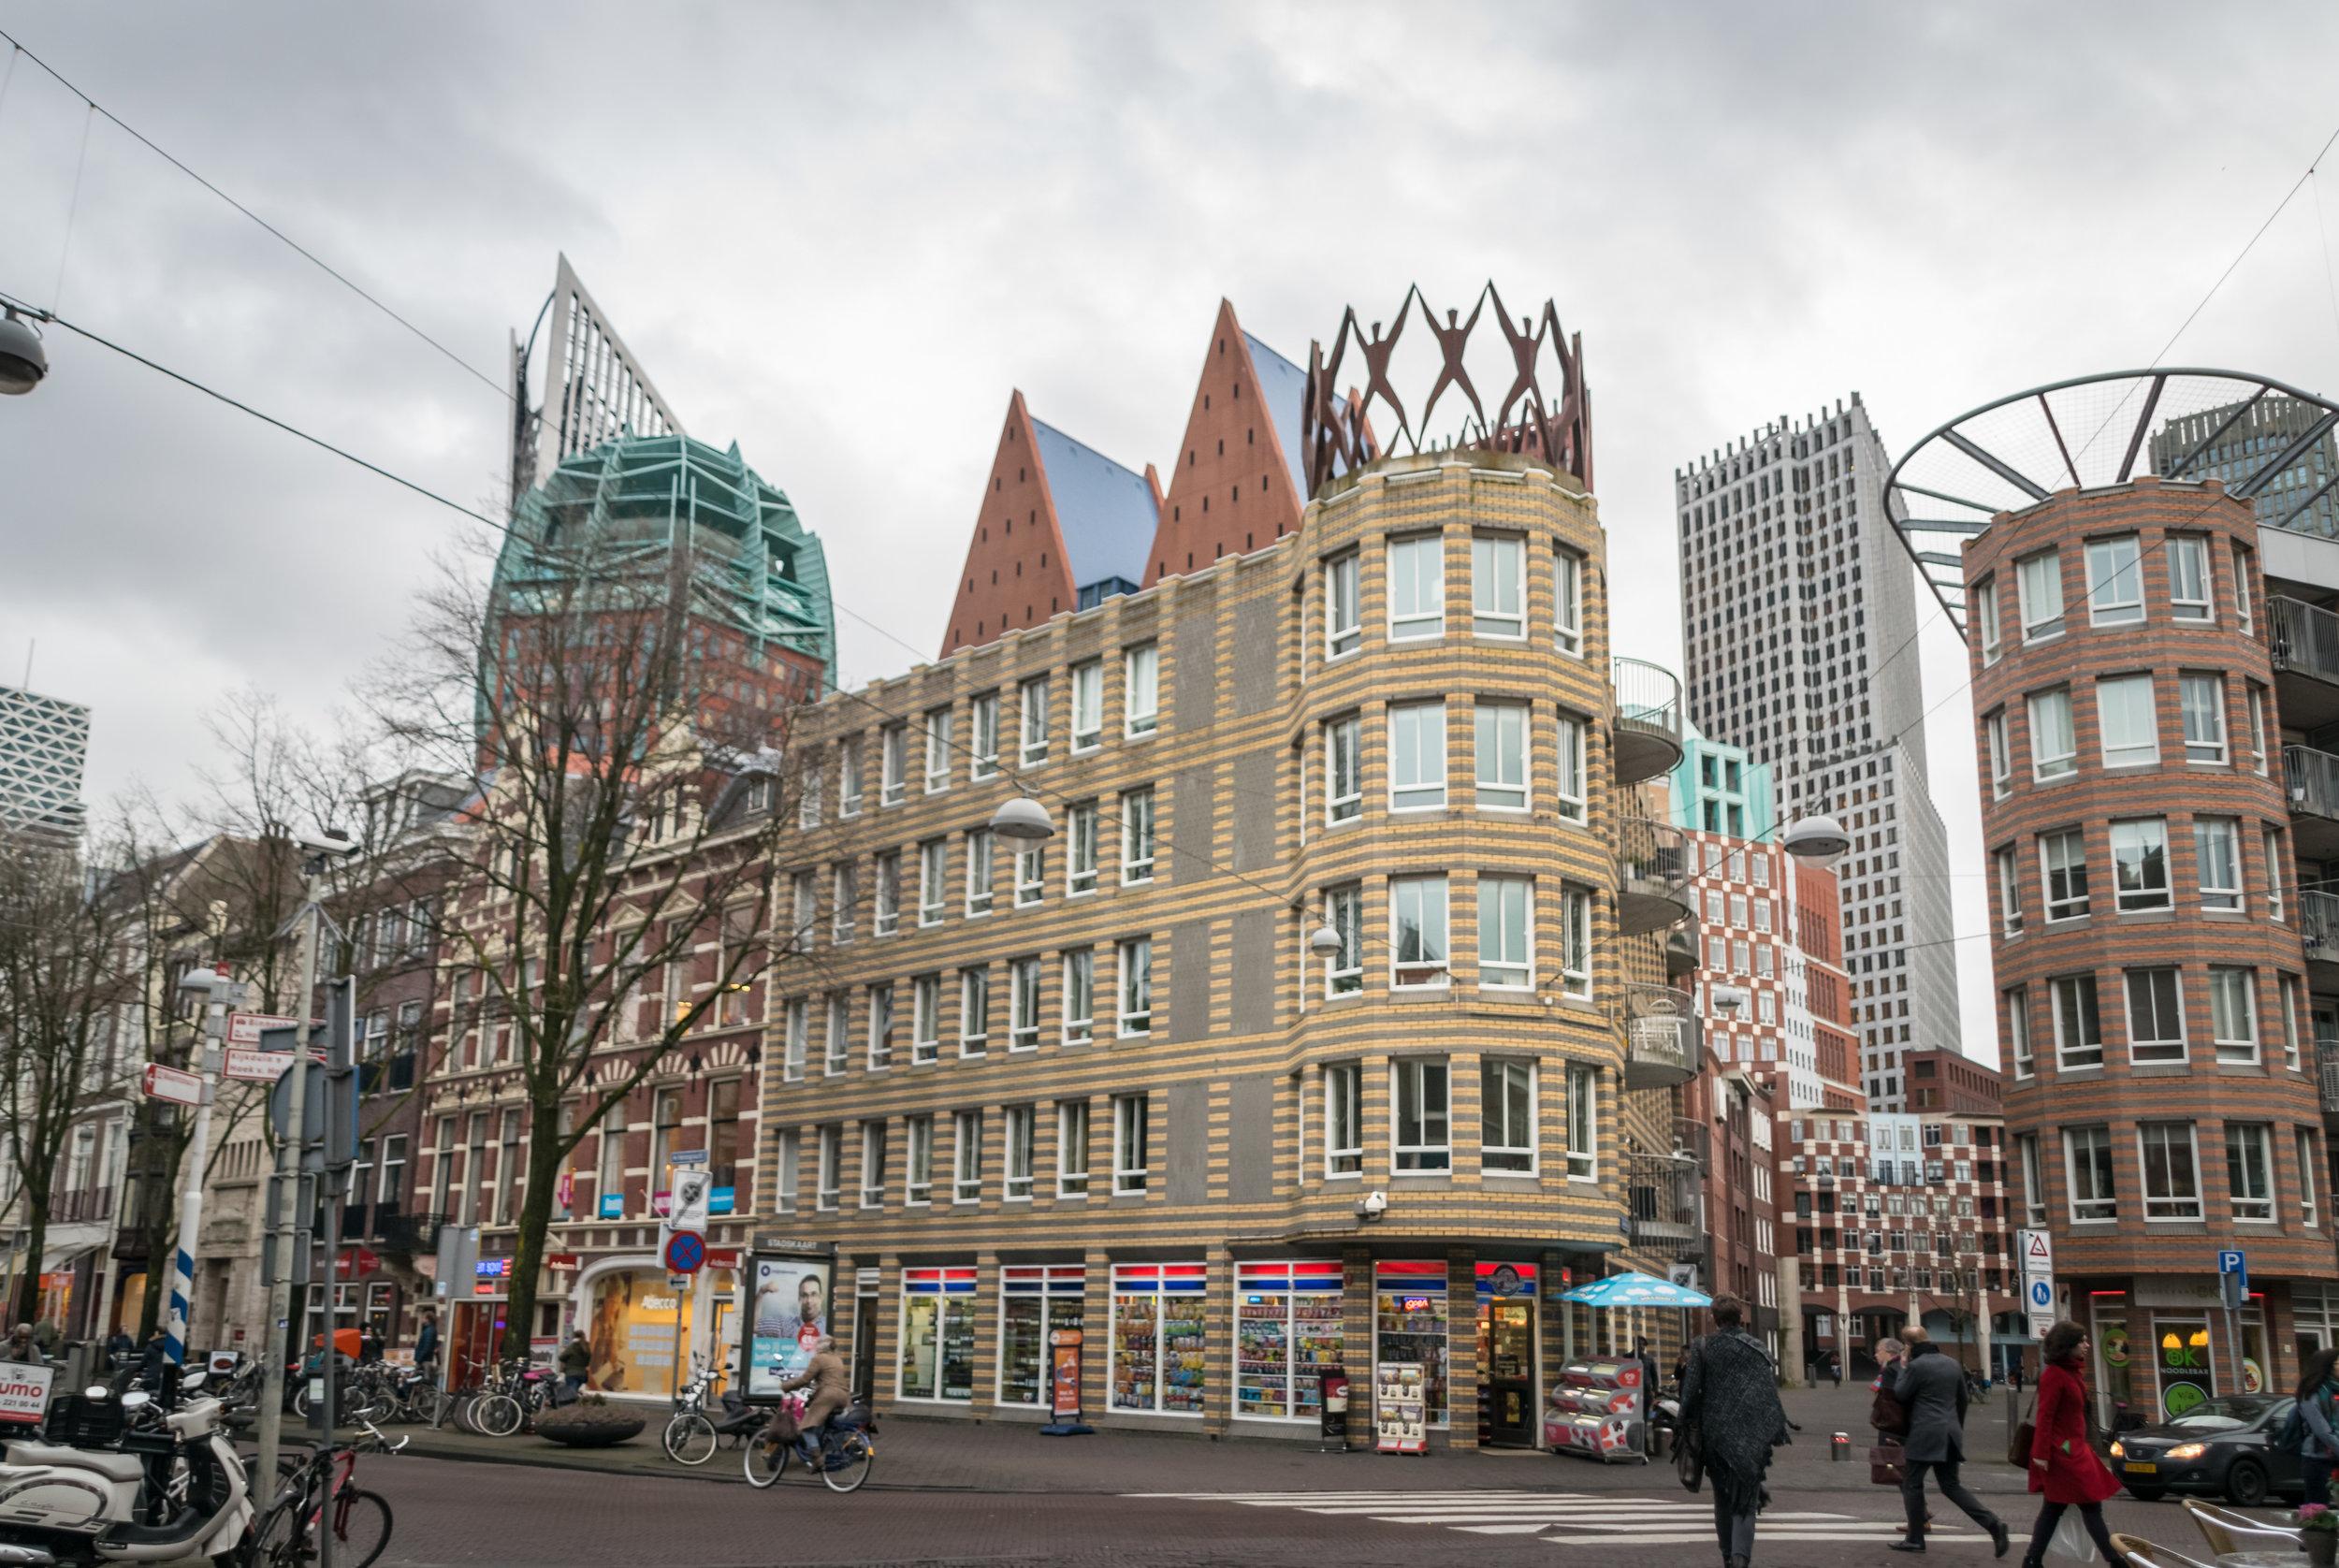 The Hague scenes-15.jpg